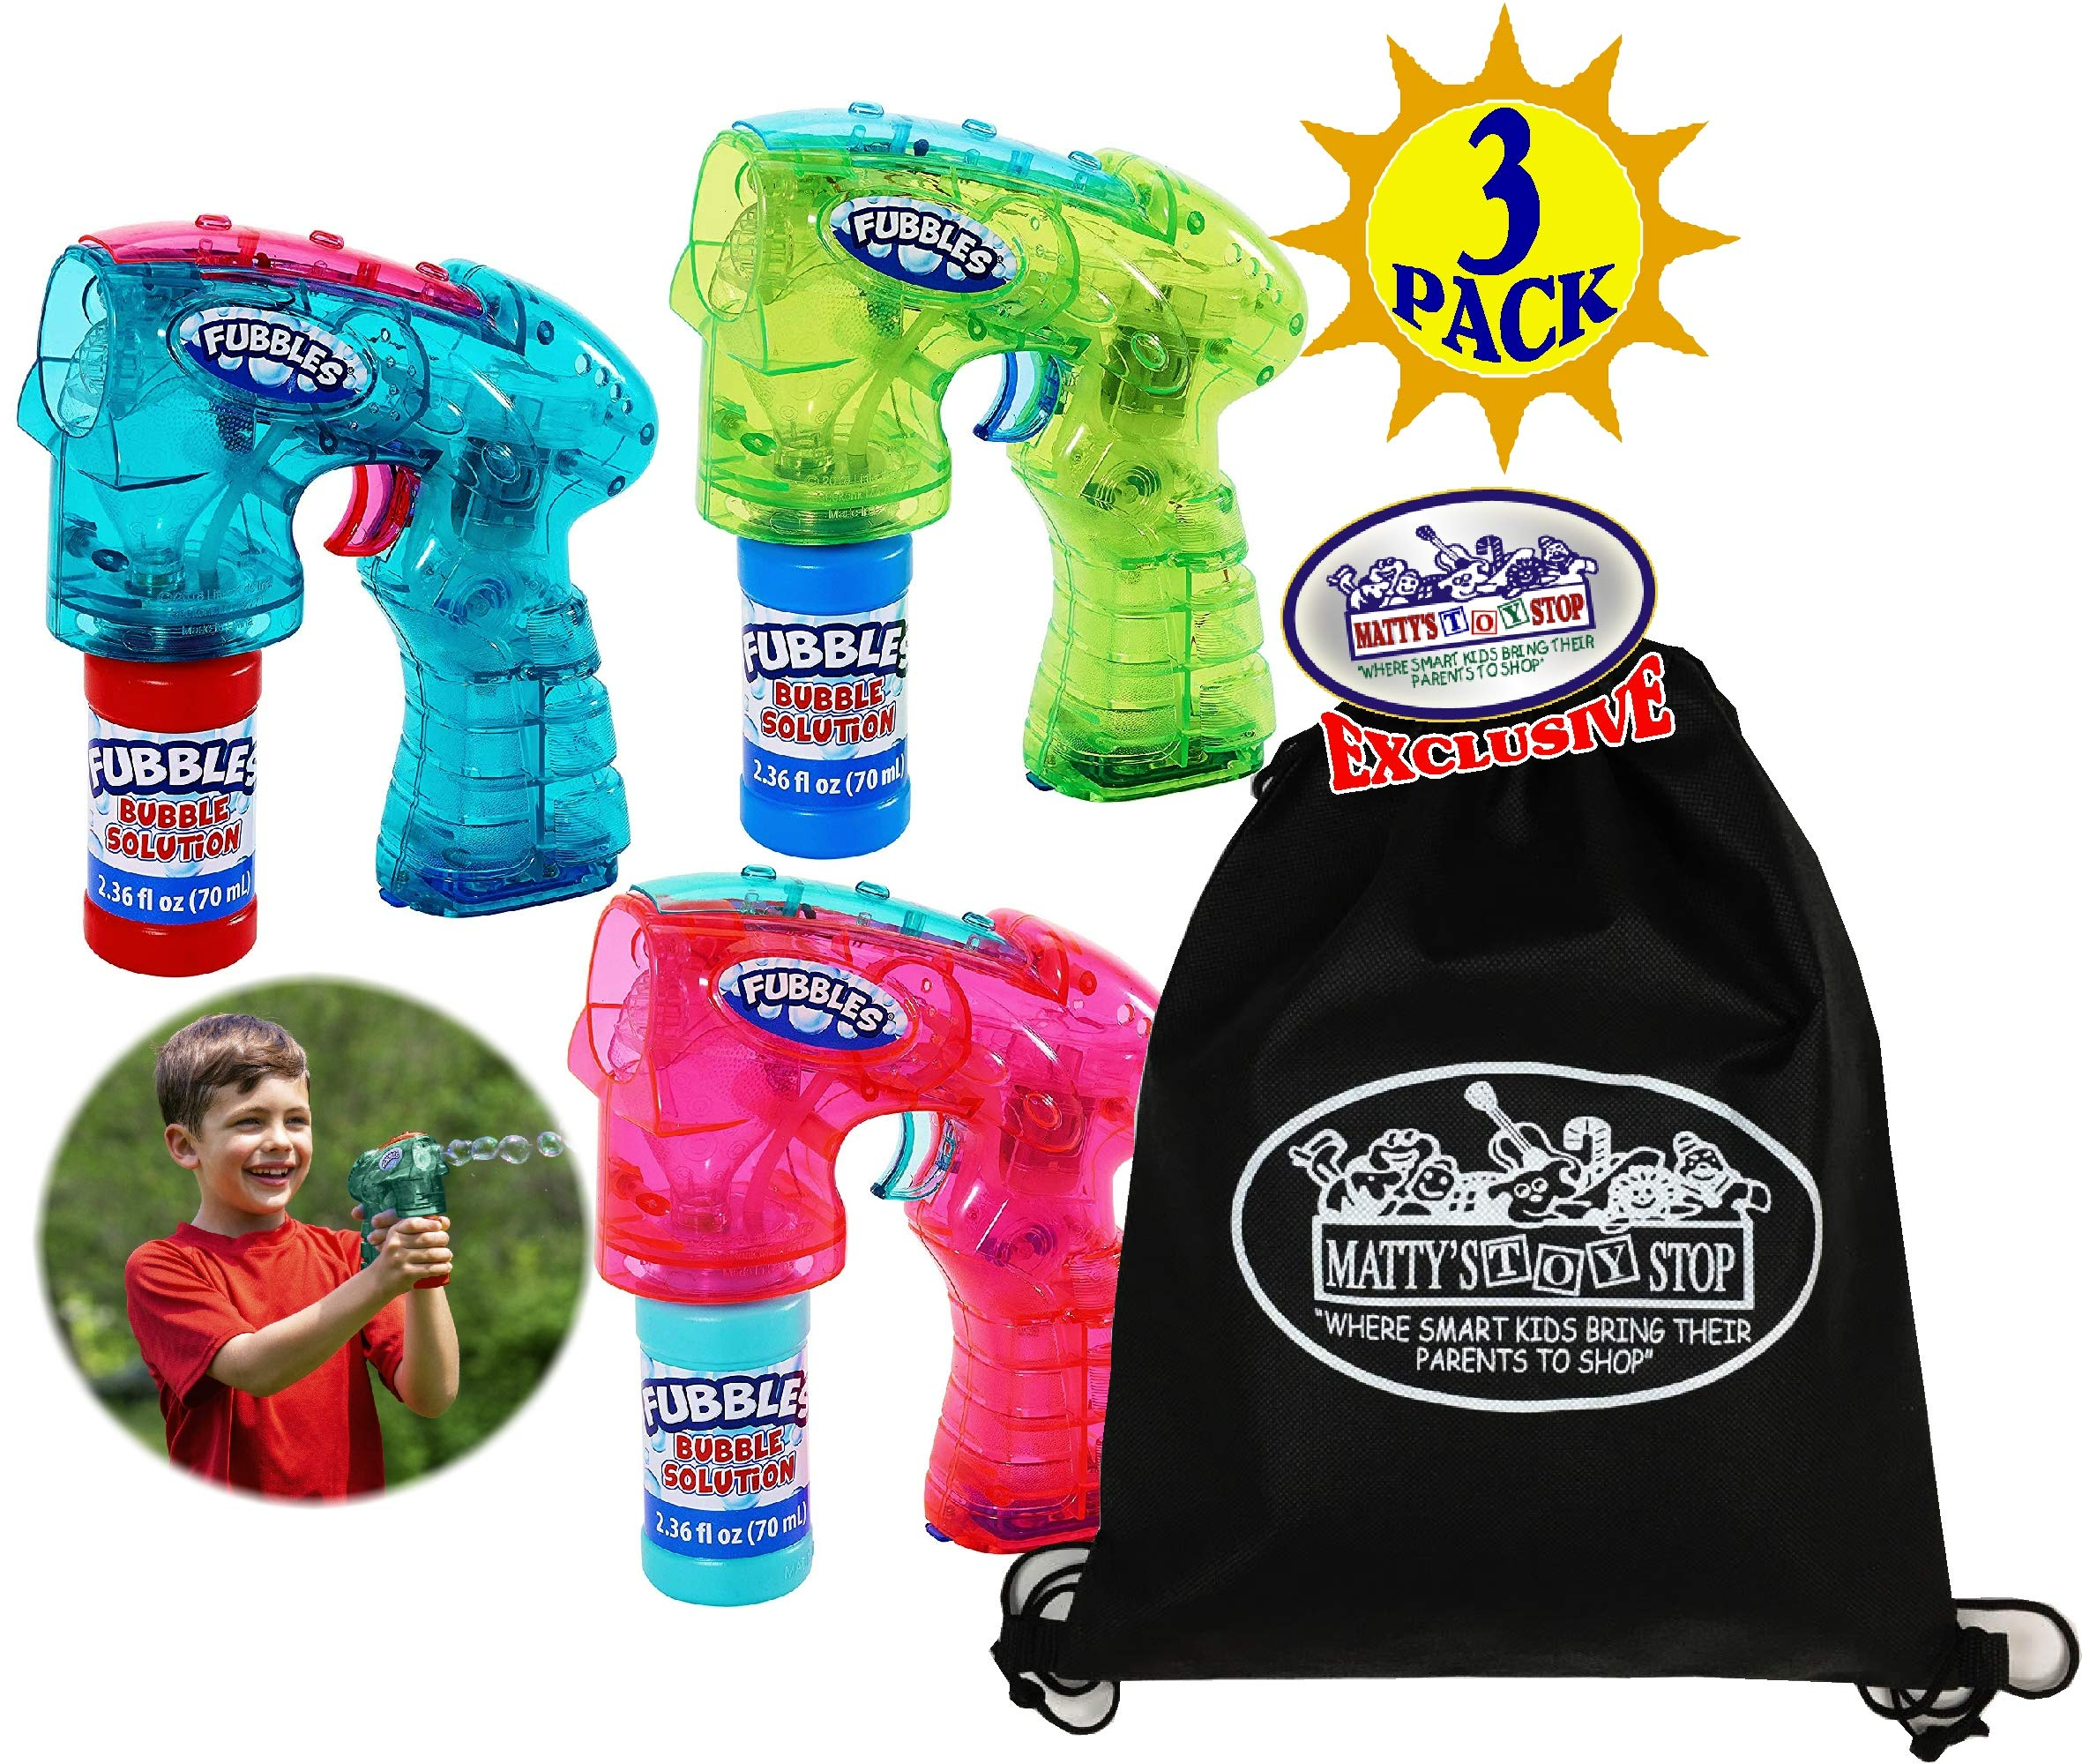 Little Kids Fubbles Light-Up Bubble Blasters Green/Blue, Teal/Pink & Pink/Teal Gift Set Bundle with Bonus Matty's Toy Stop Storage Bag - 3 Pack